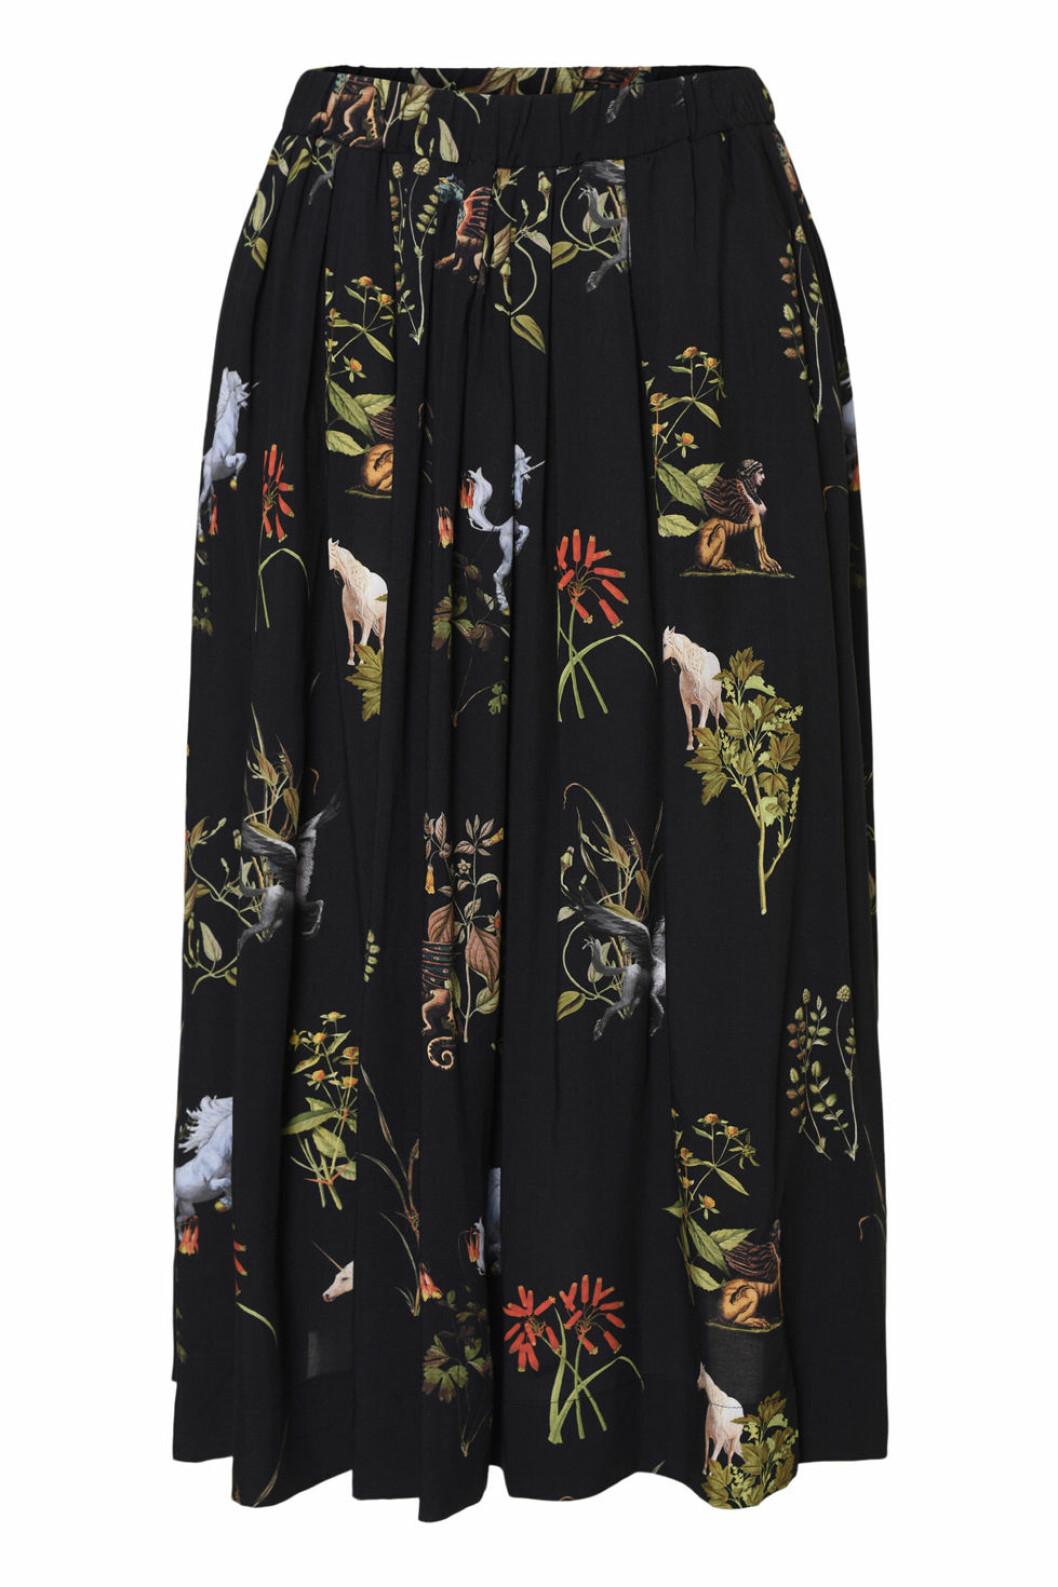 Maria Westerlind x MQ blommig kjol